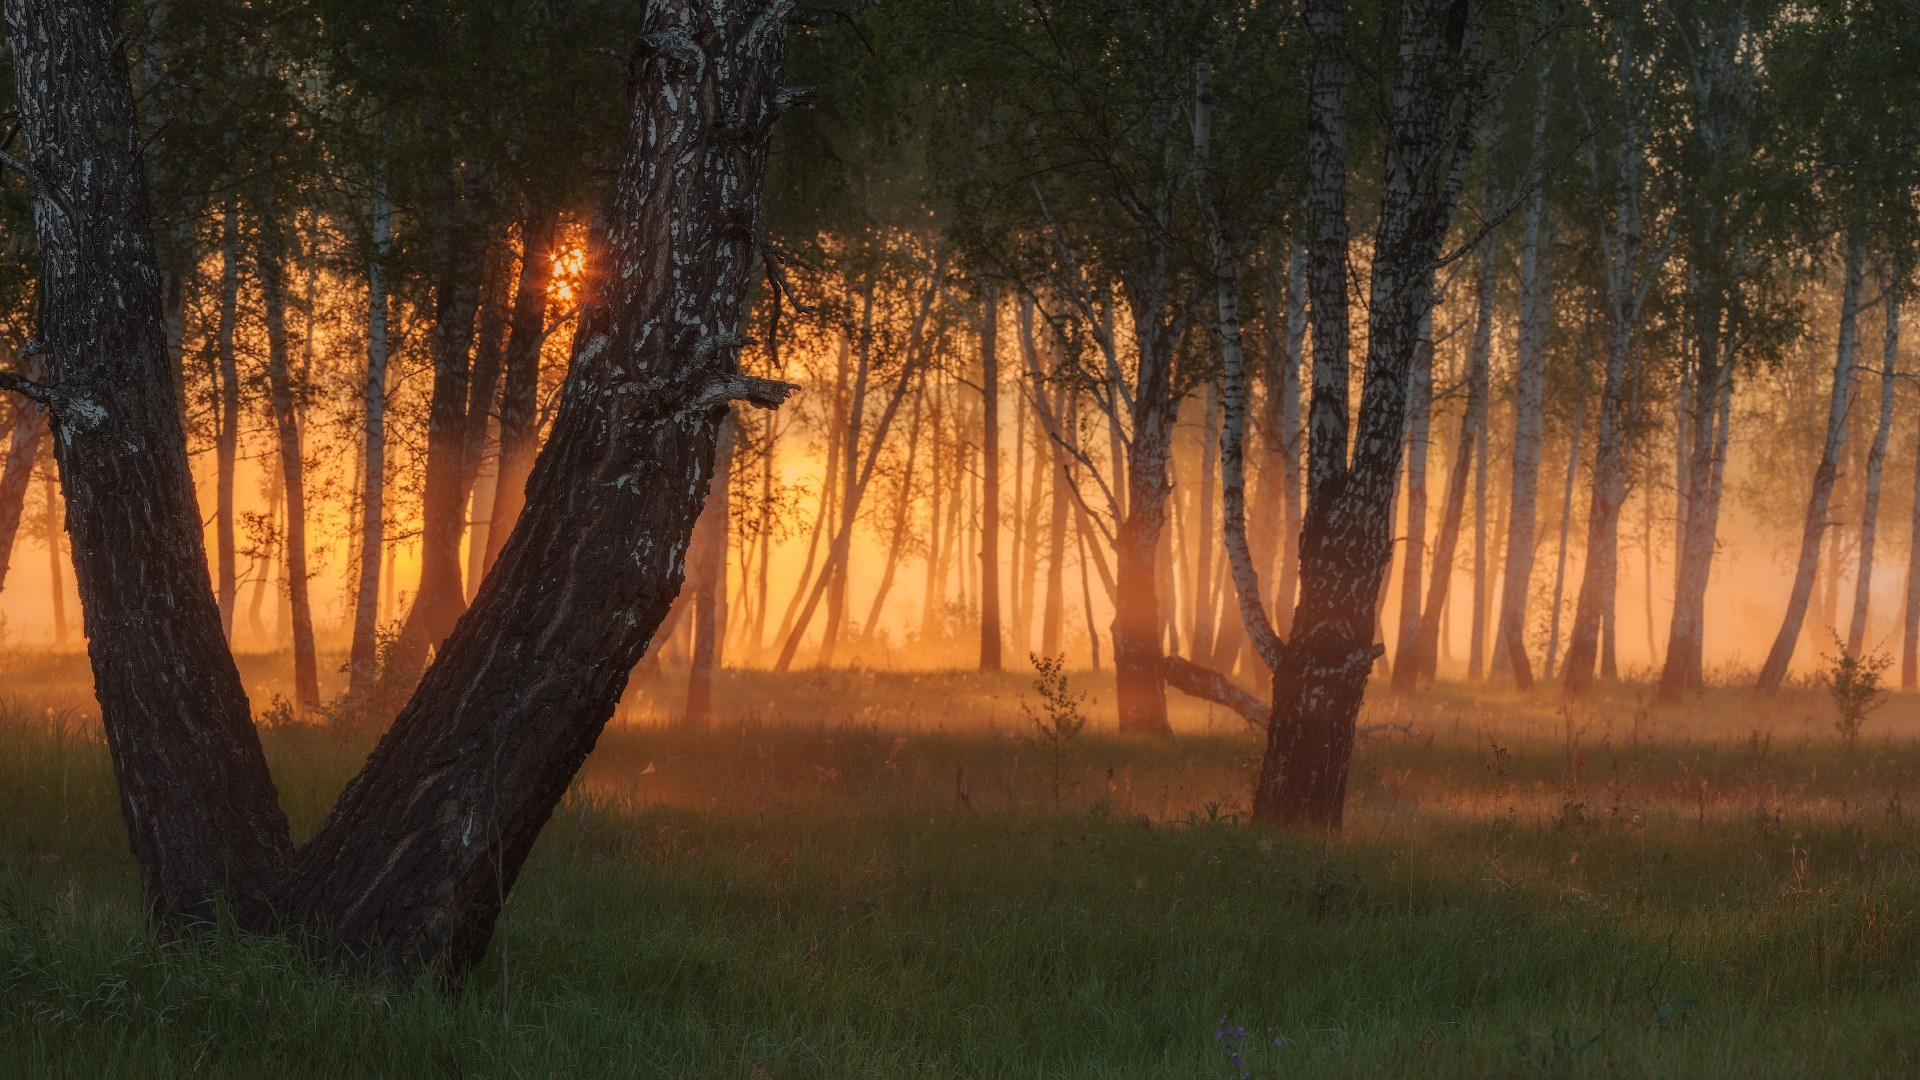 картинка красивого заката в лесу